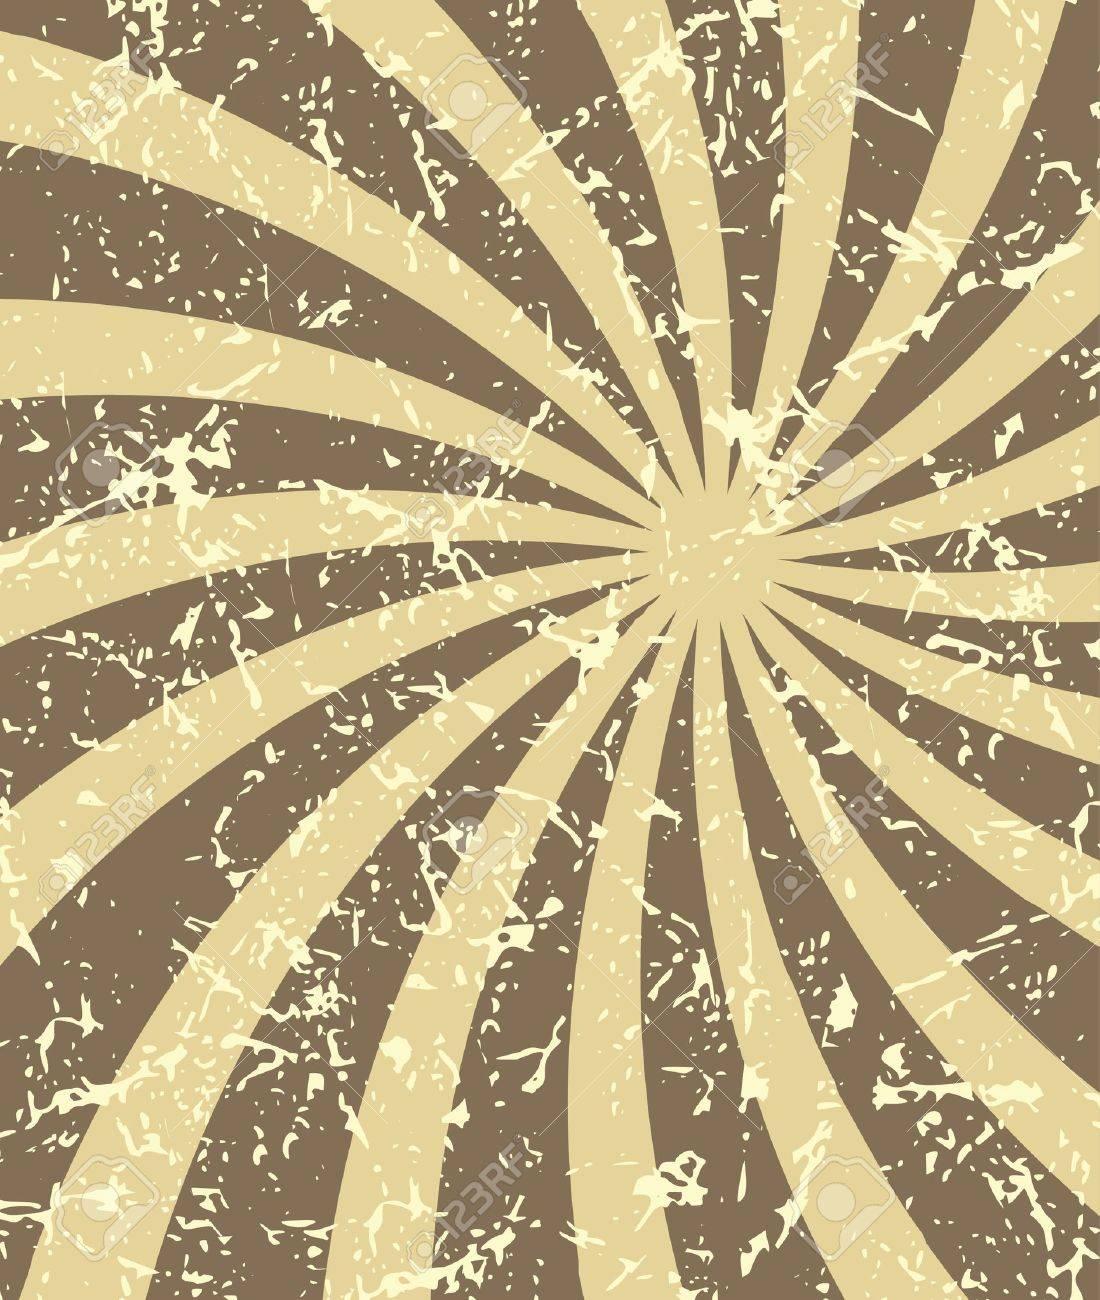 Retro vintage grunge hypnotic background Stock Vector - 19003715